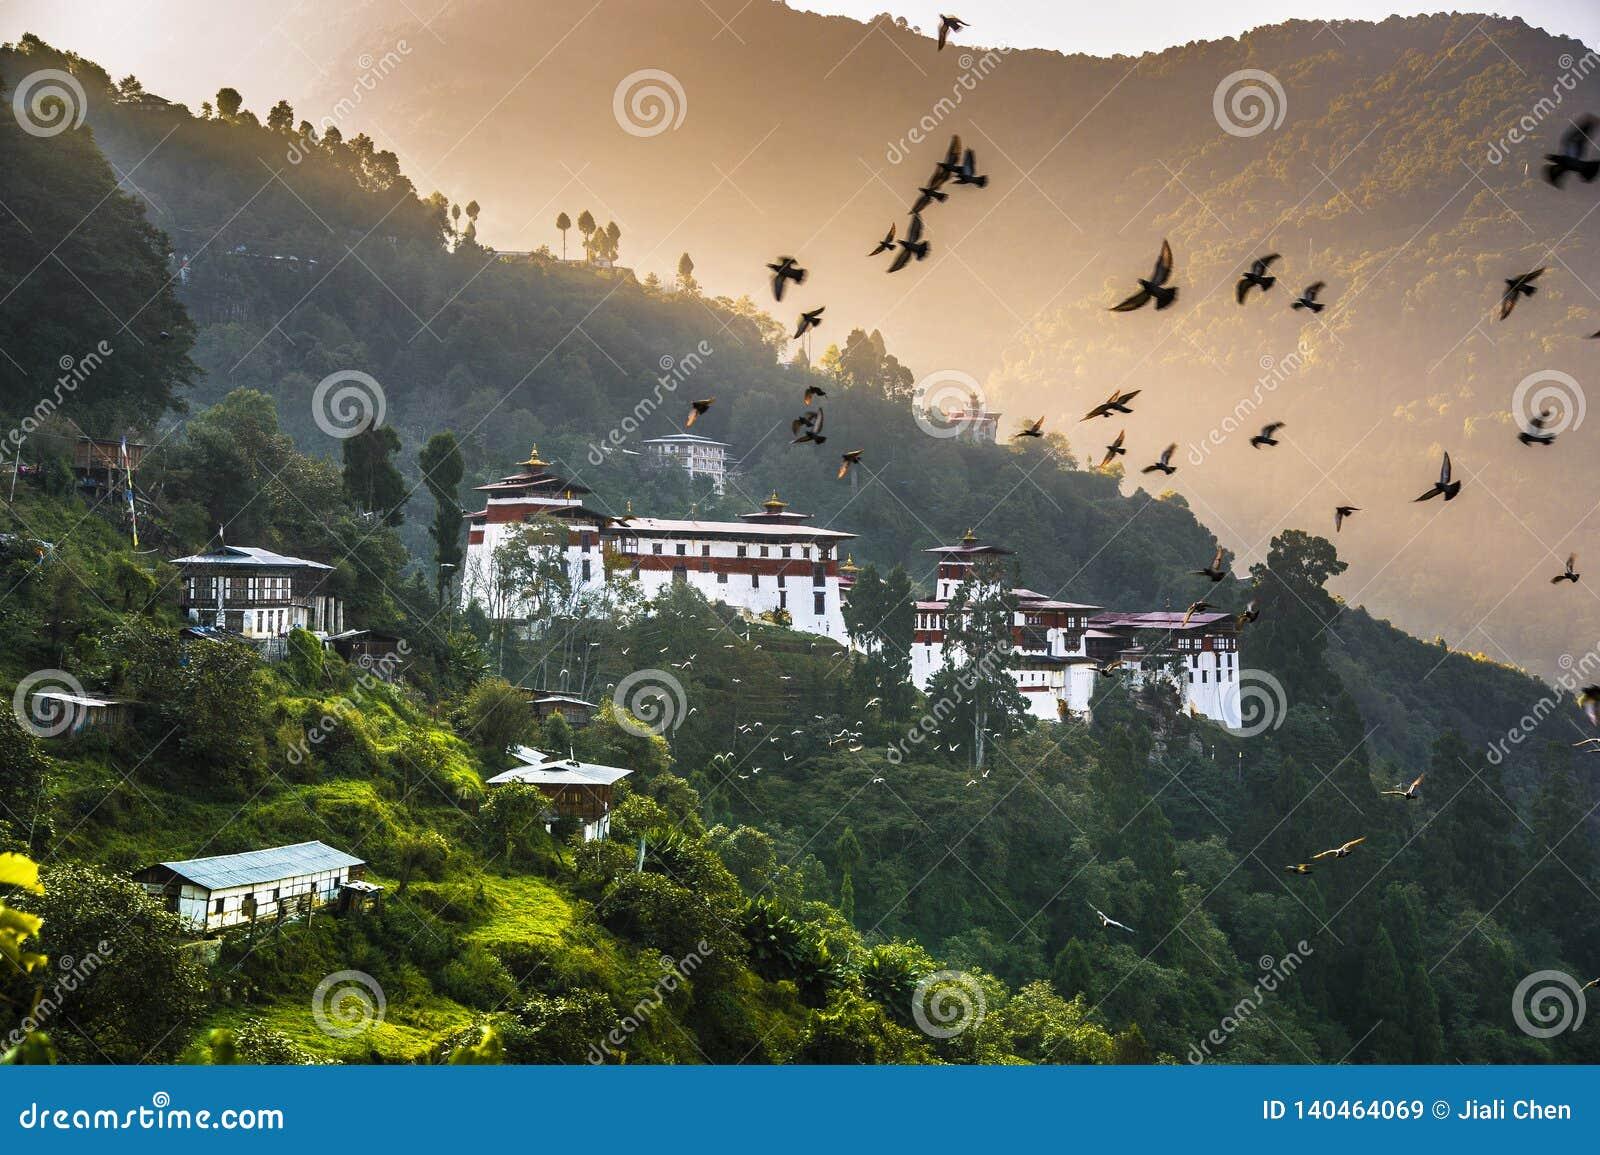 dating bhutan